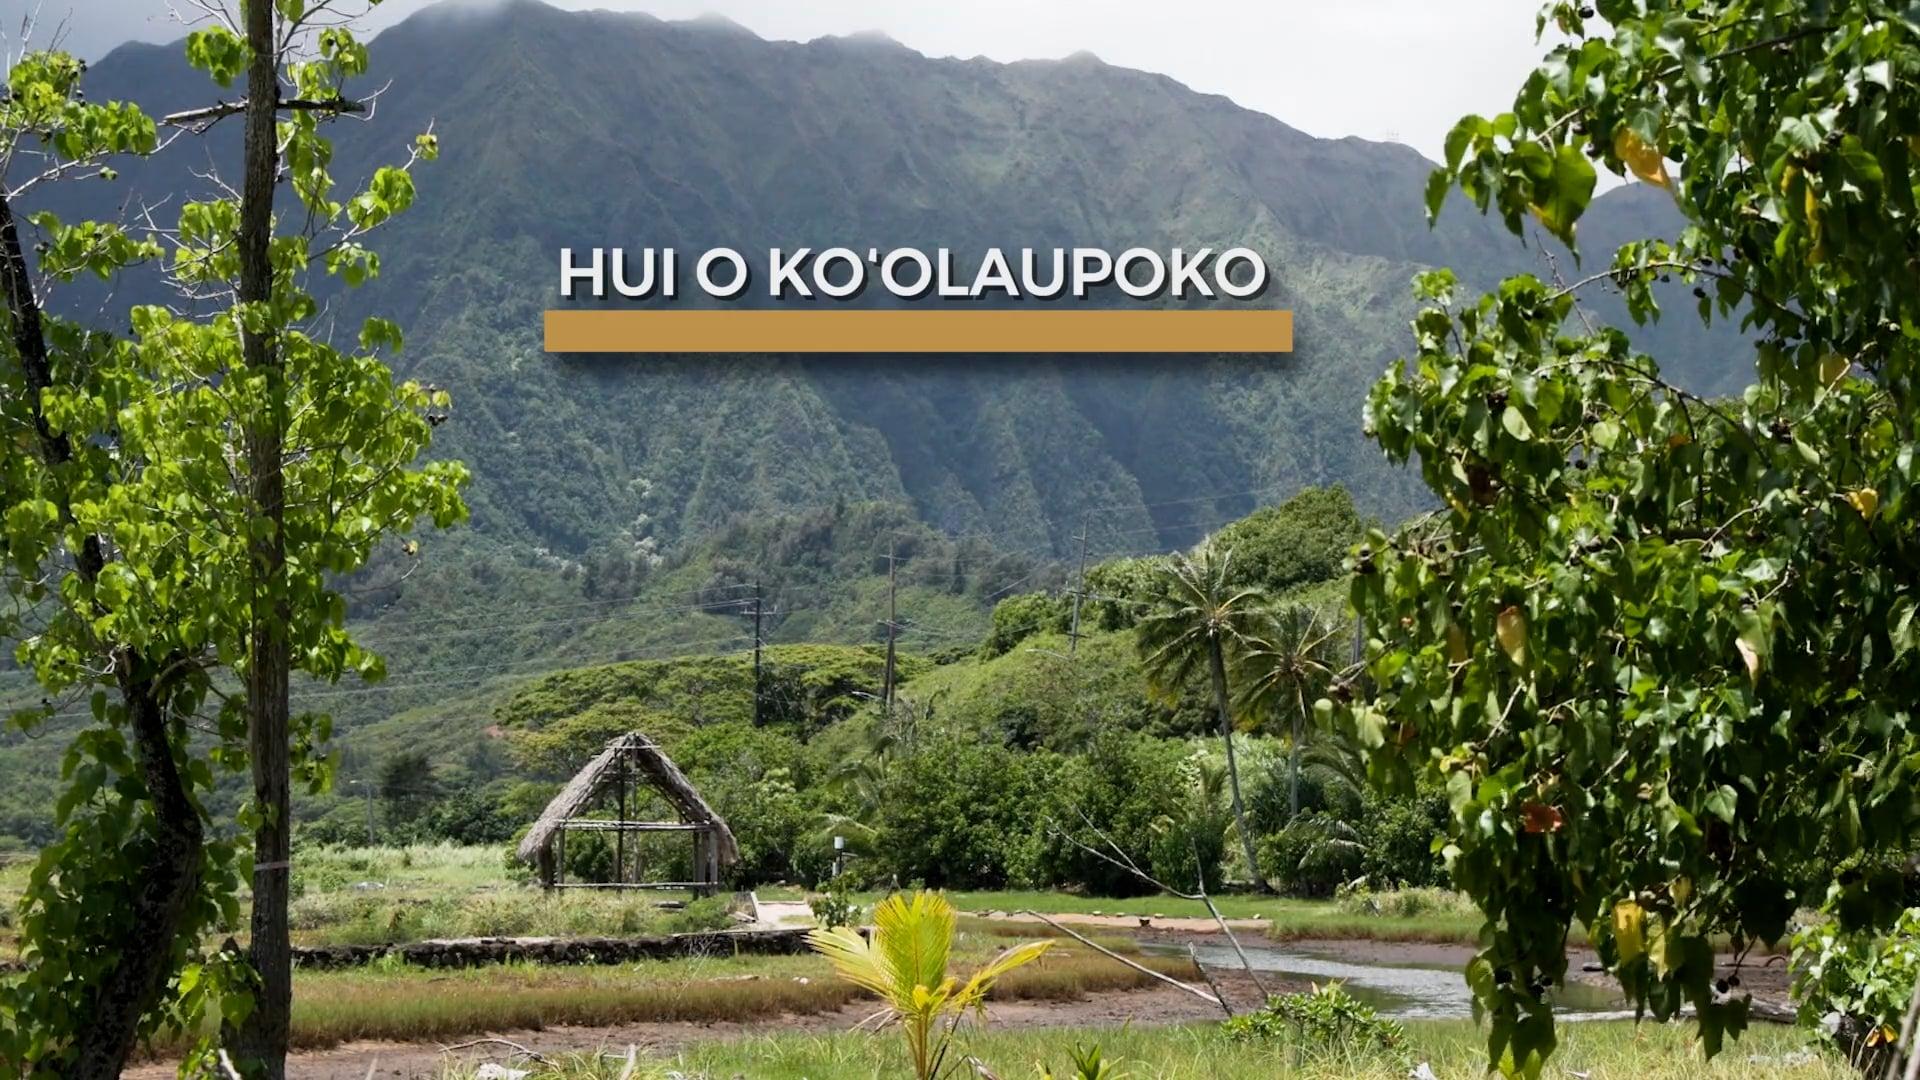 Community Restoration Partnership: Hui o Ko'olaupoko